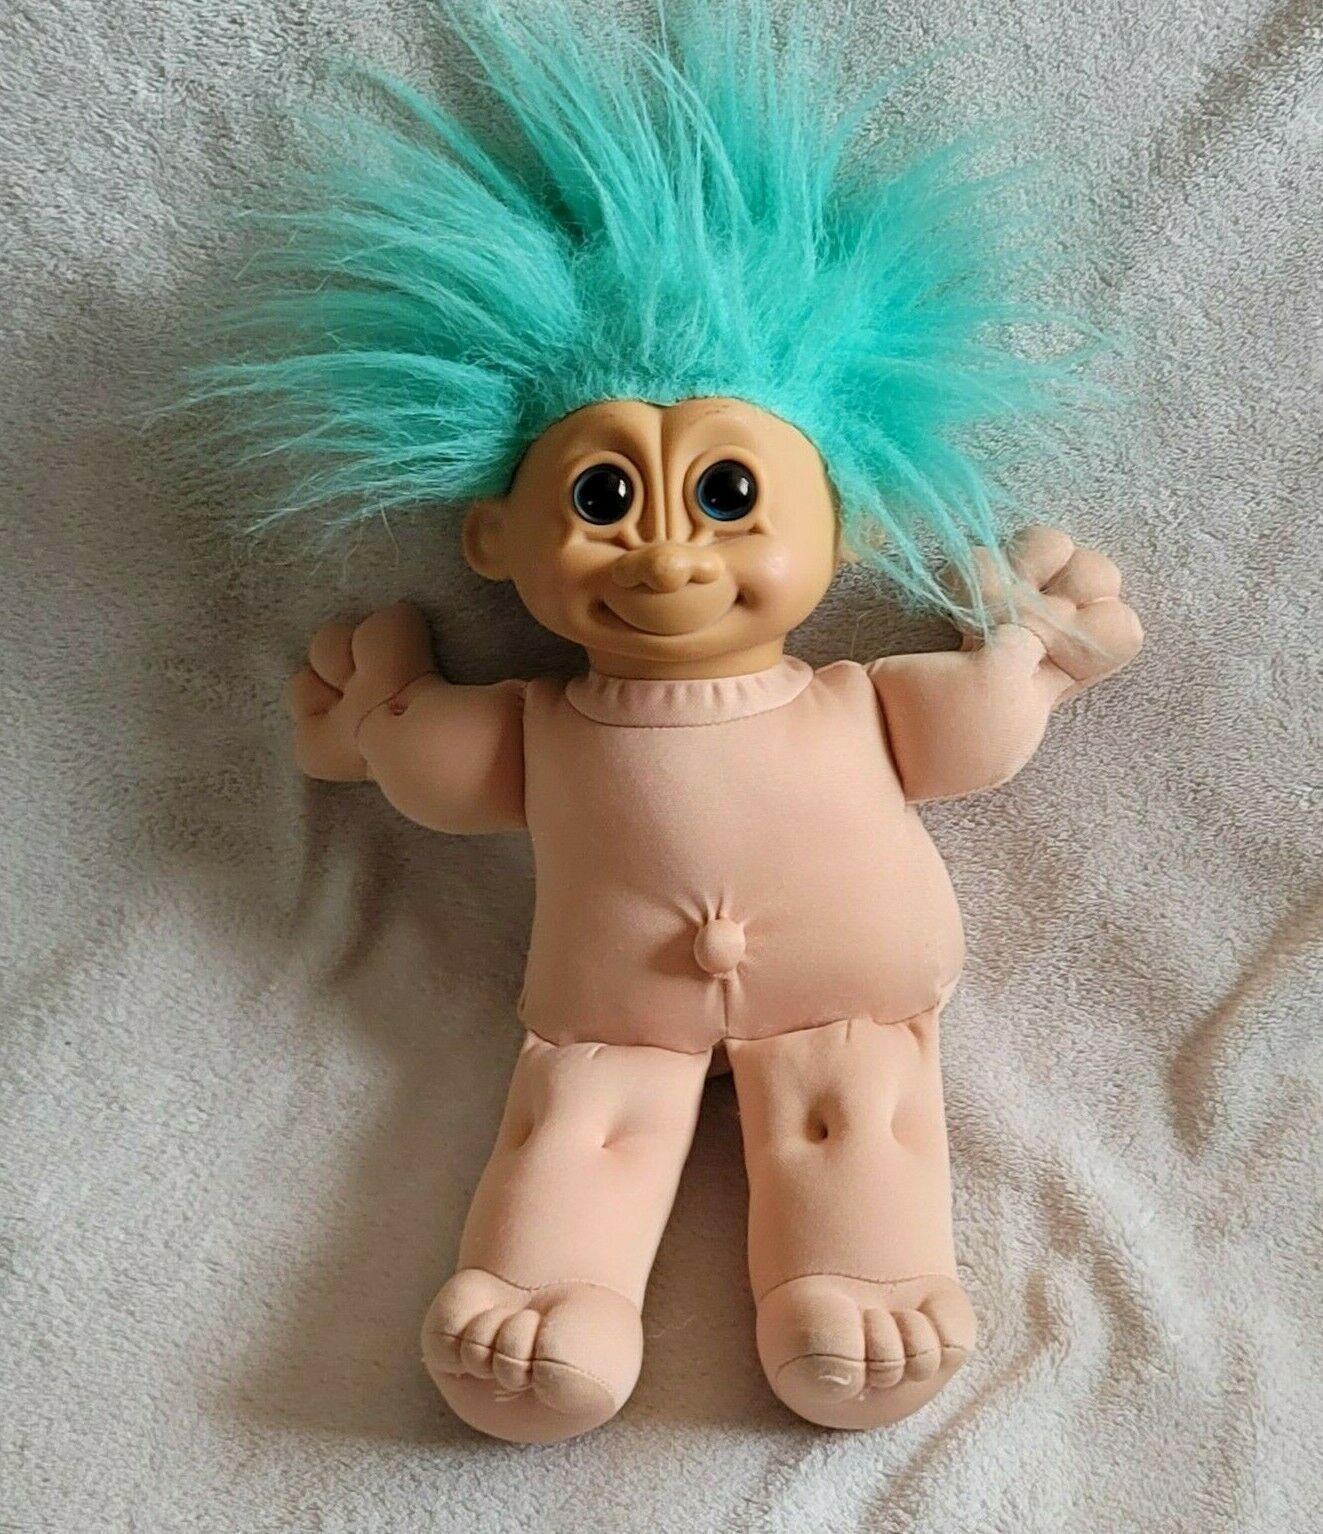 Russ Troll Kids Kidz Stuffed Plush Doll Toy Baby with Turquoise Aqua Blue Hair - $12.86